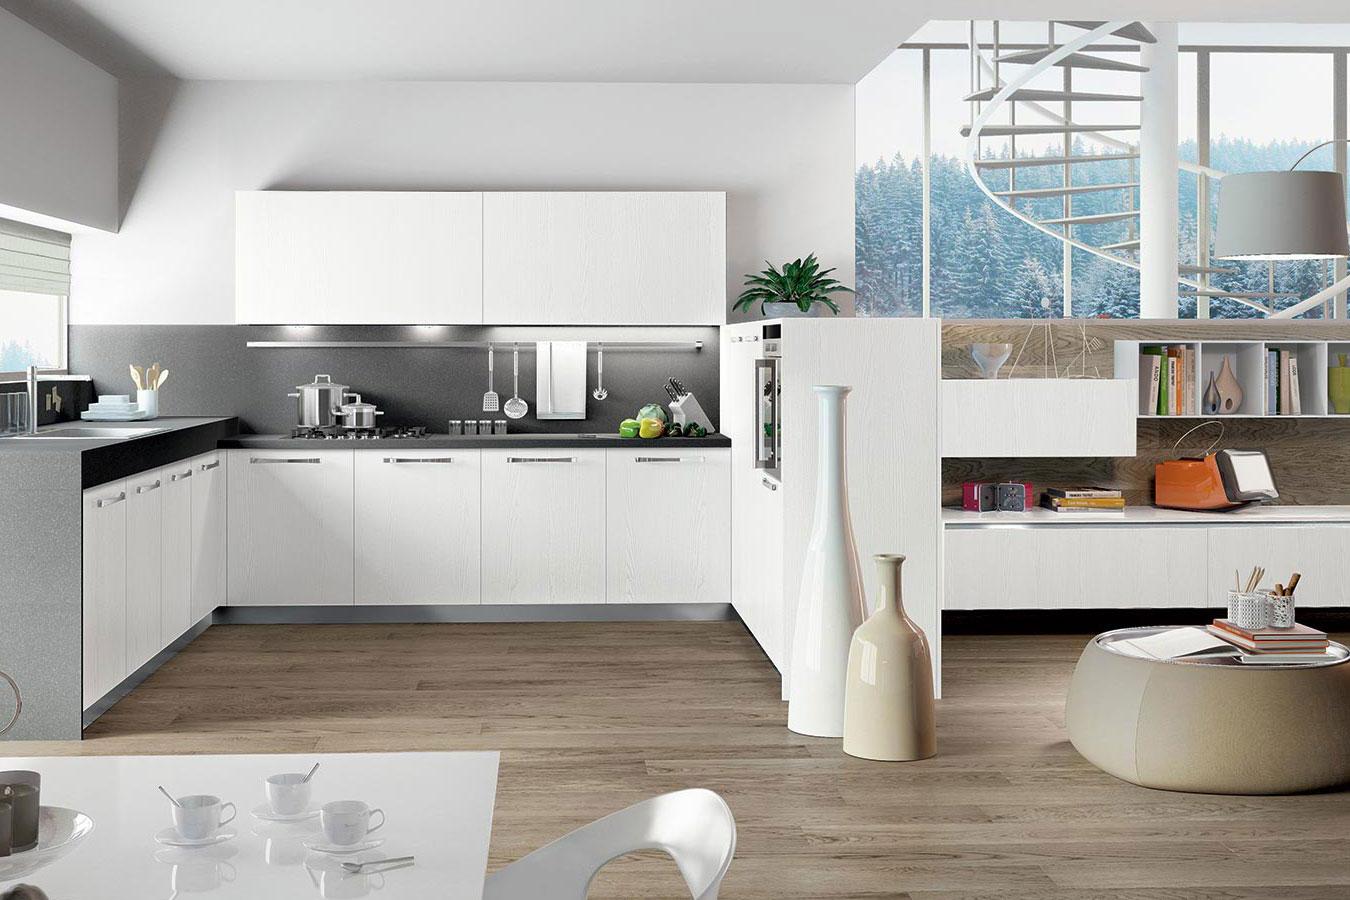 Cucina round di arredo3 righetti mobili novara - Cucina legno bianco ...